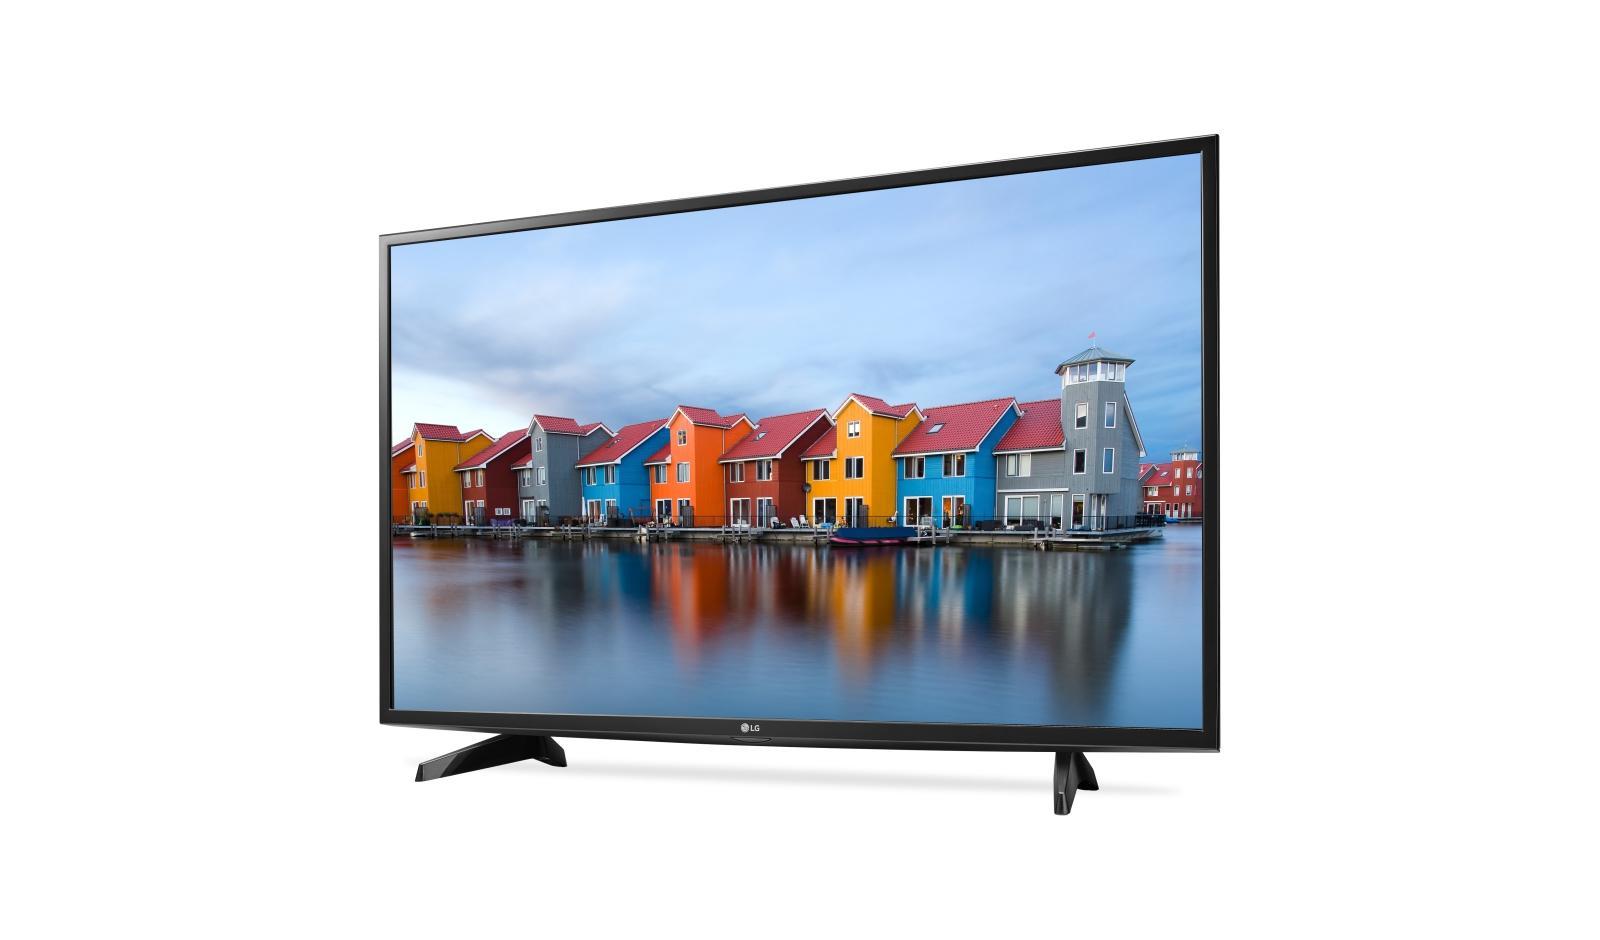 LG 49LH5700 49 inch 1080p Smart LED TV